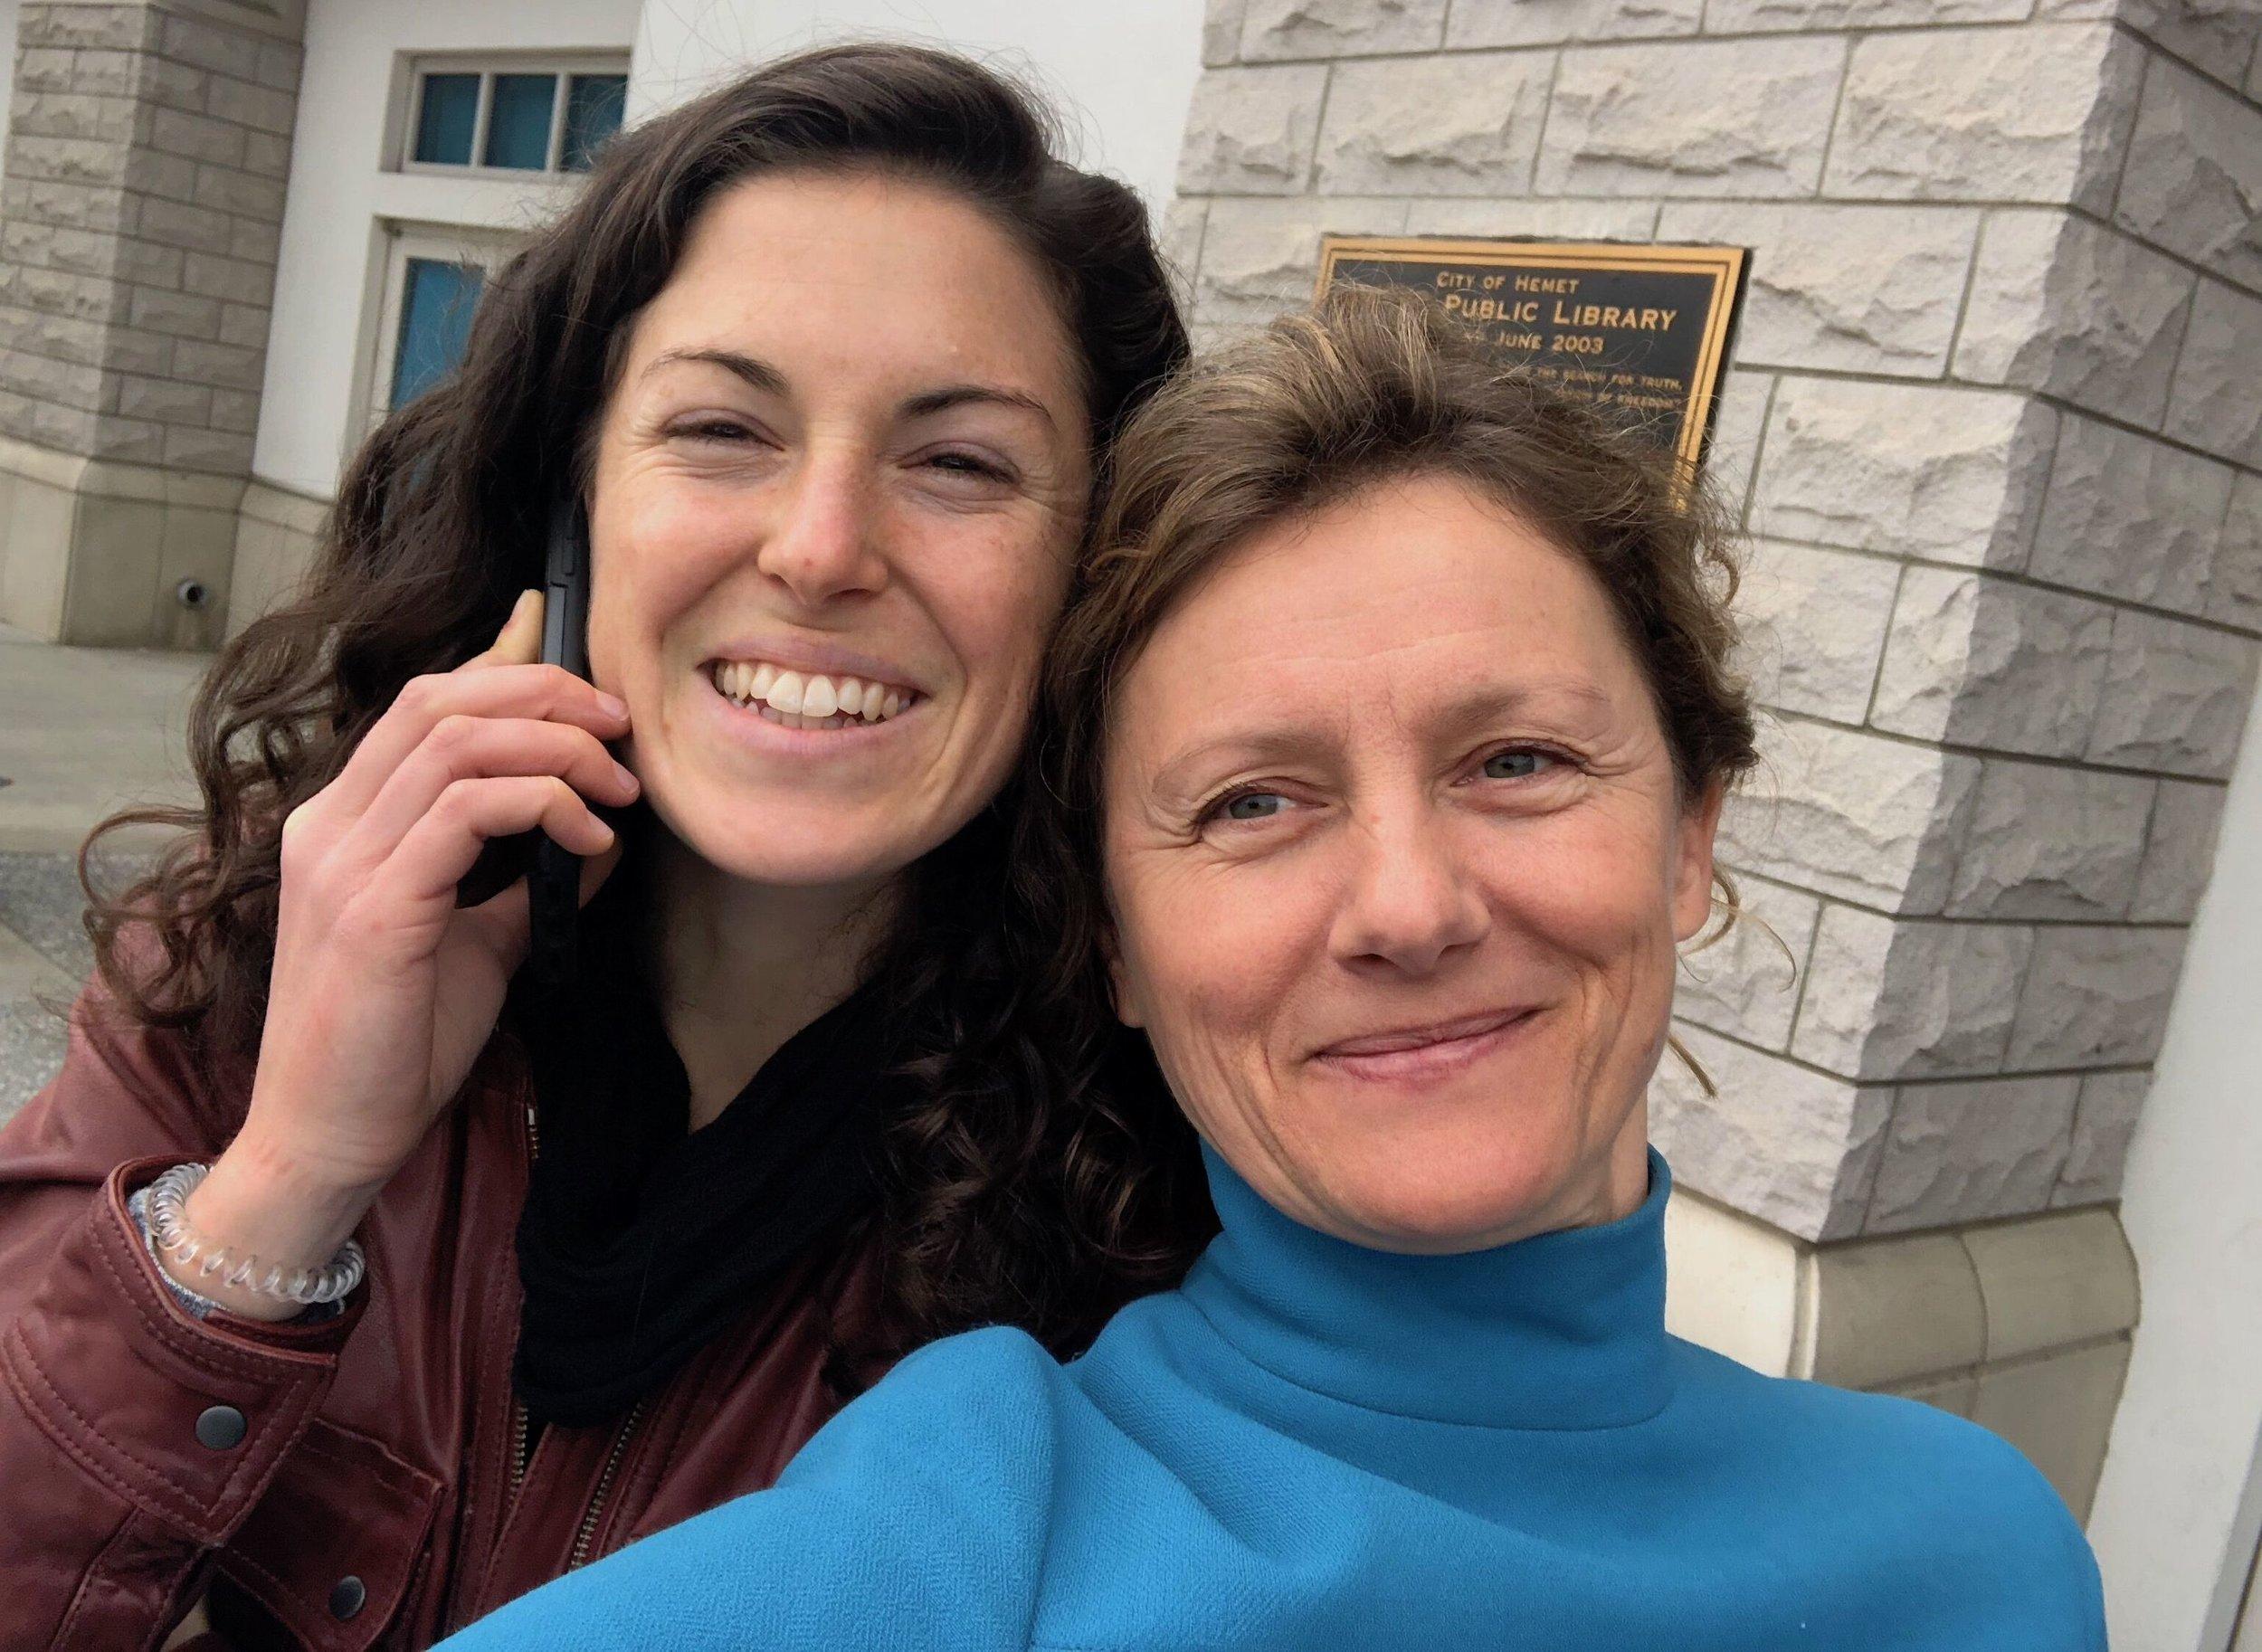 Katie McFadden and Tanja Dzambazova